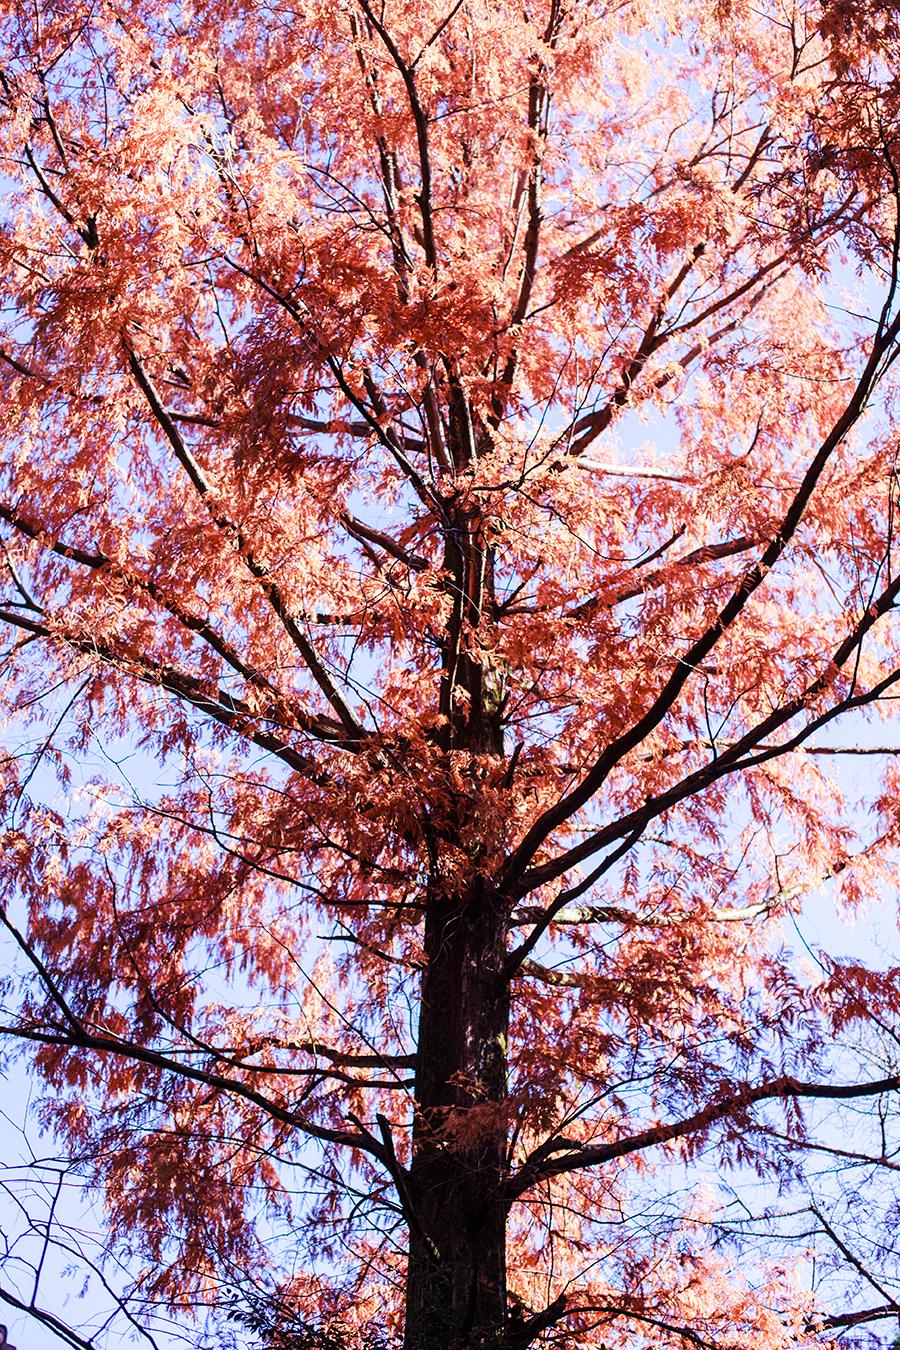 Orange red momiji (maple tree) at Fushimi Inari in Kyoto, Japan.